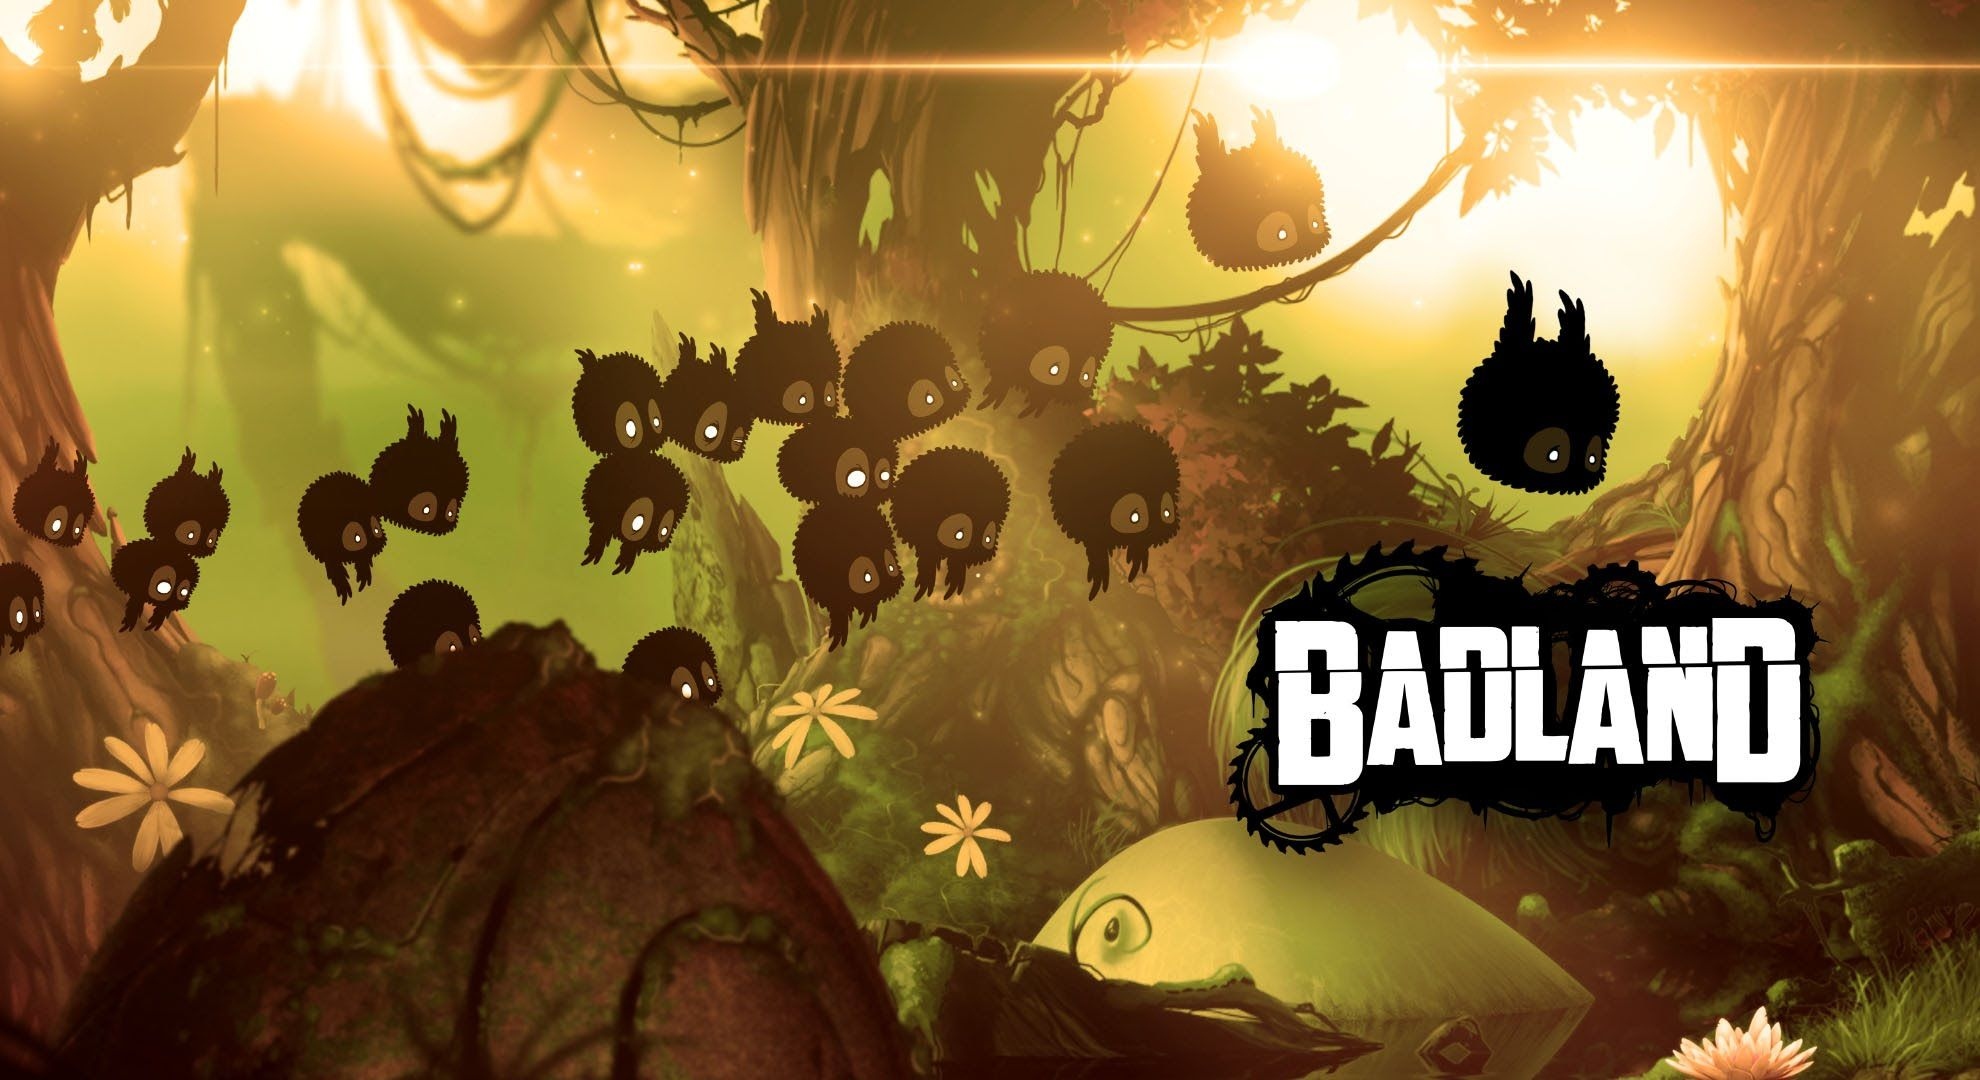 Badland is a singlebutton flappybirdlike game that